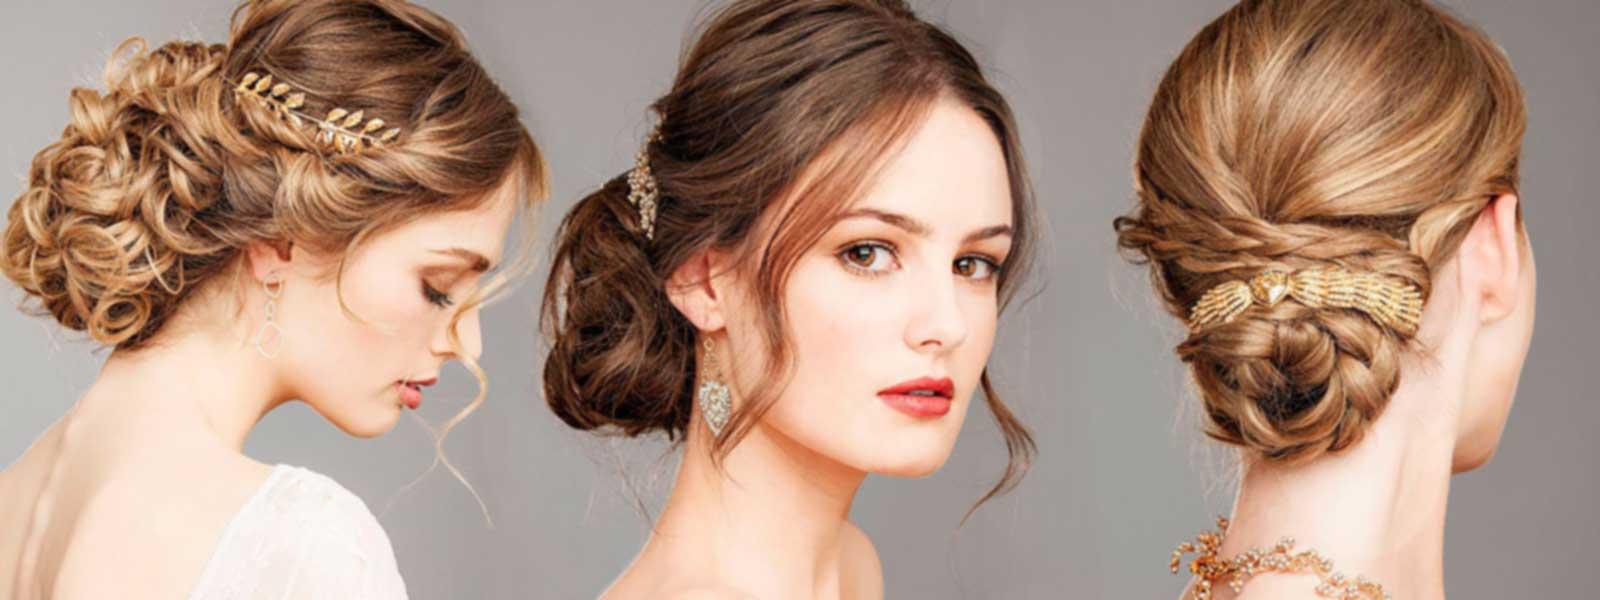 Peinados para novias y para madrinas de boda